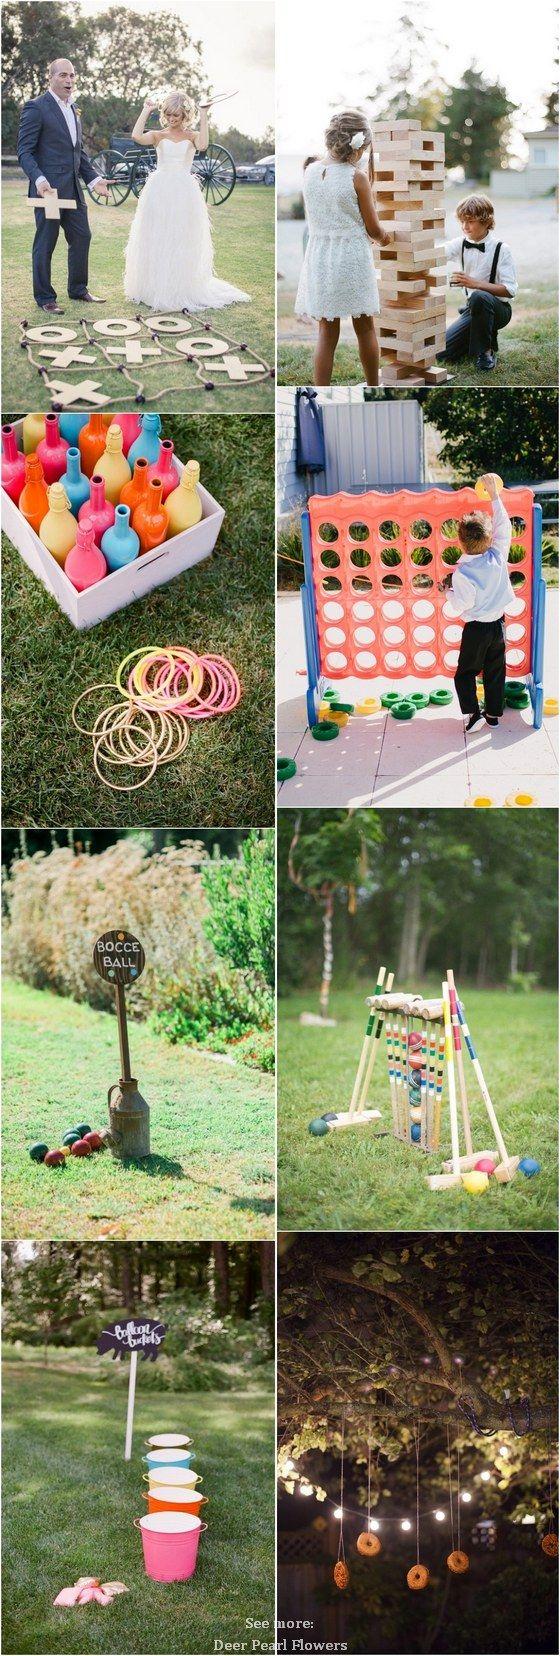 Best 25 Lawn Games Wedding ideas on Pinterest  Outdoor